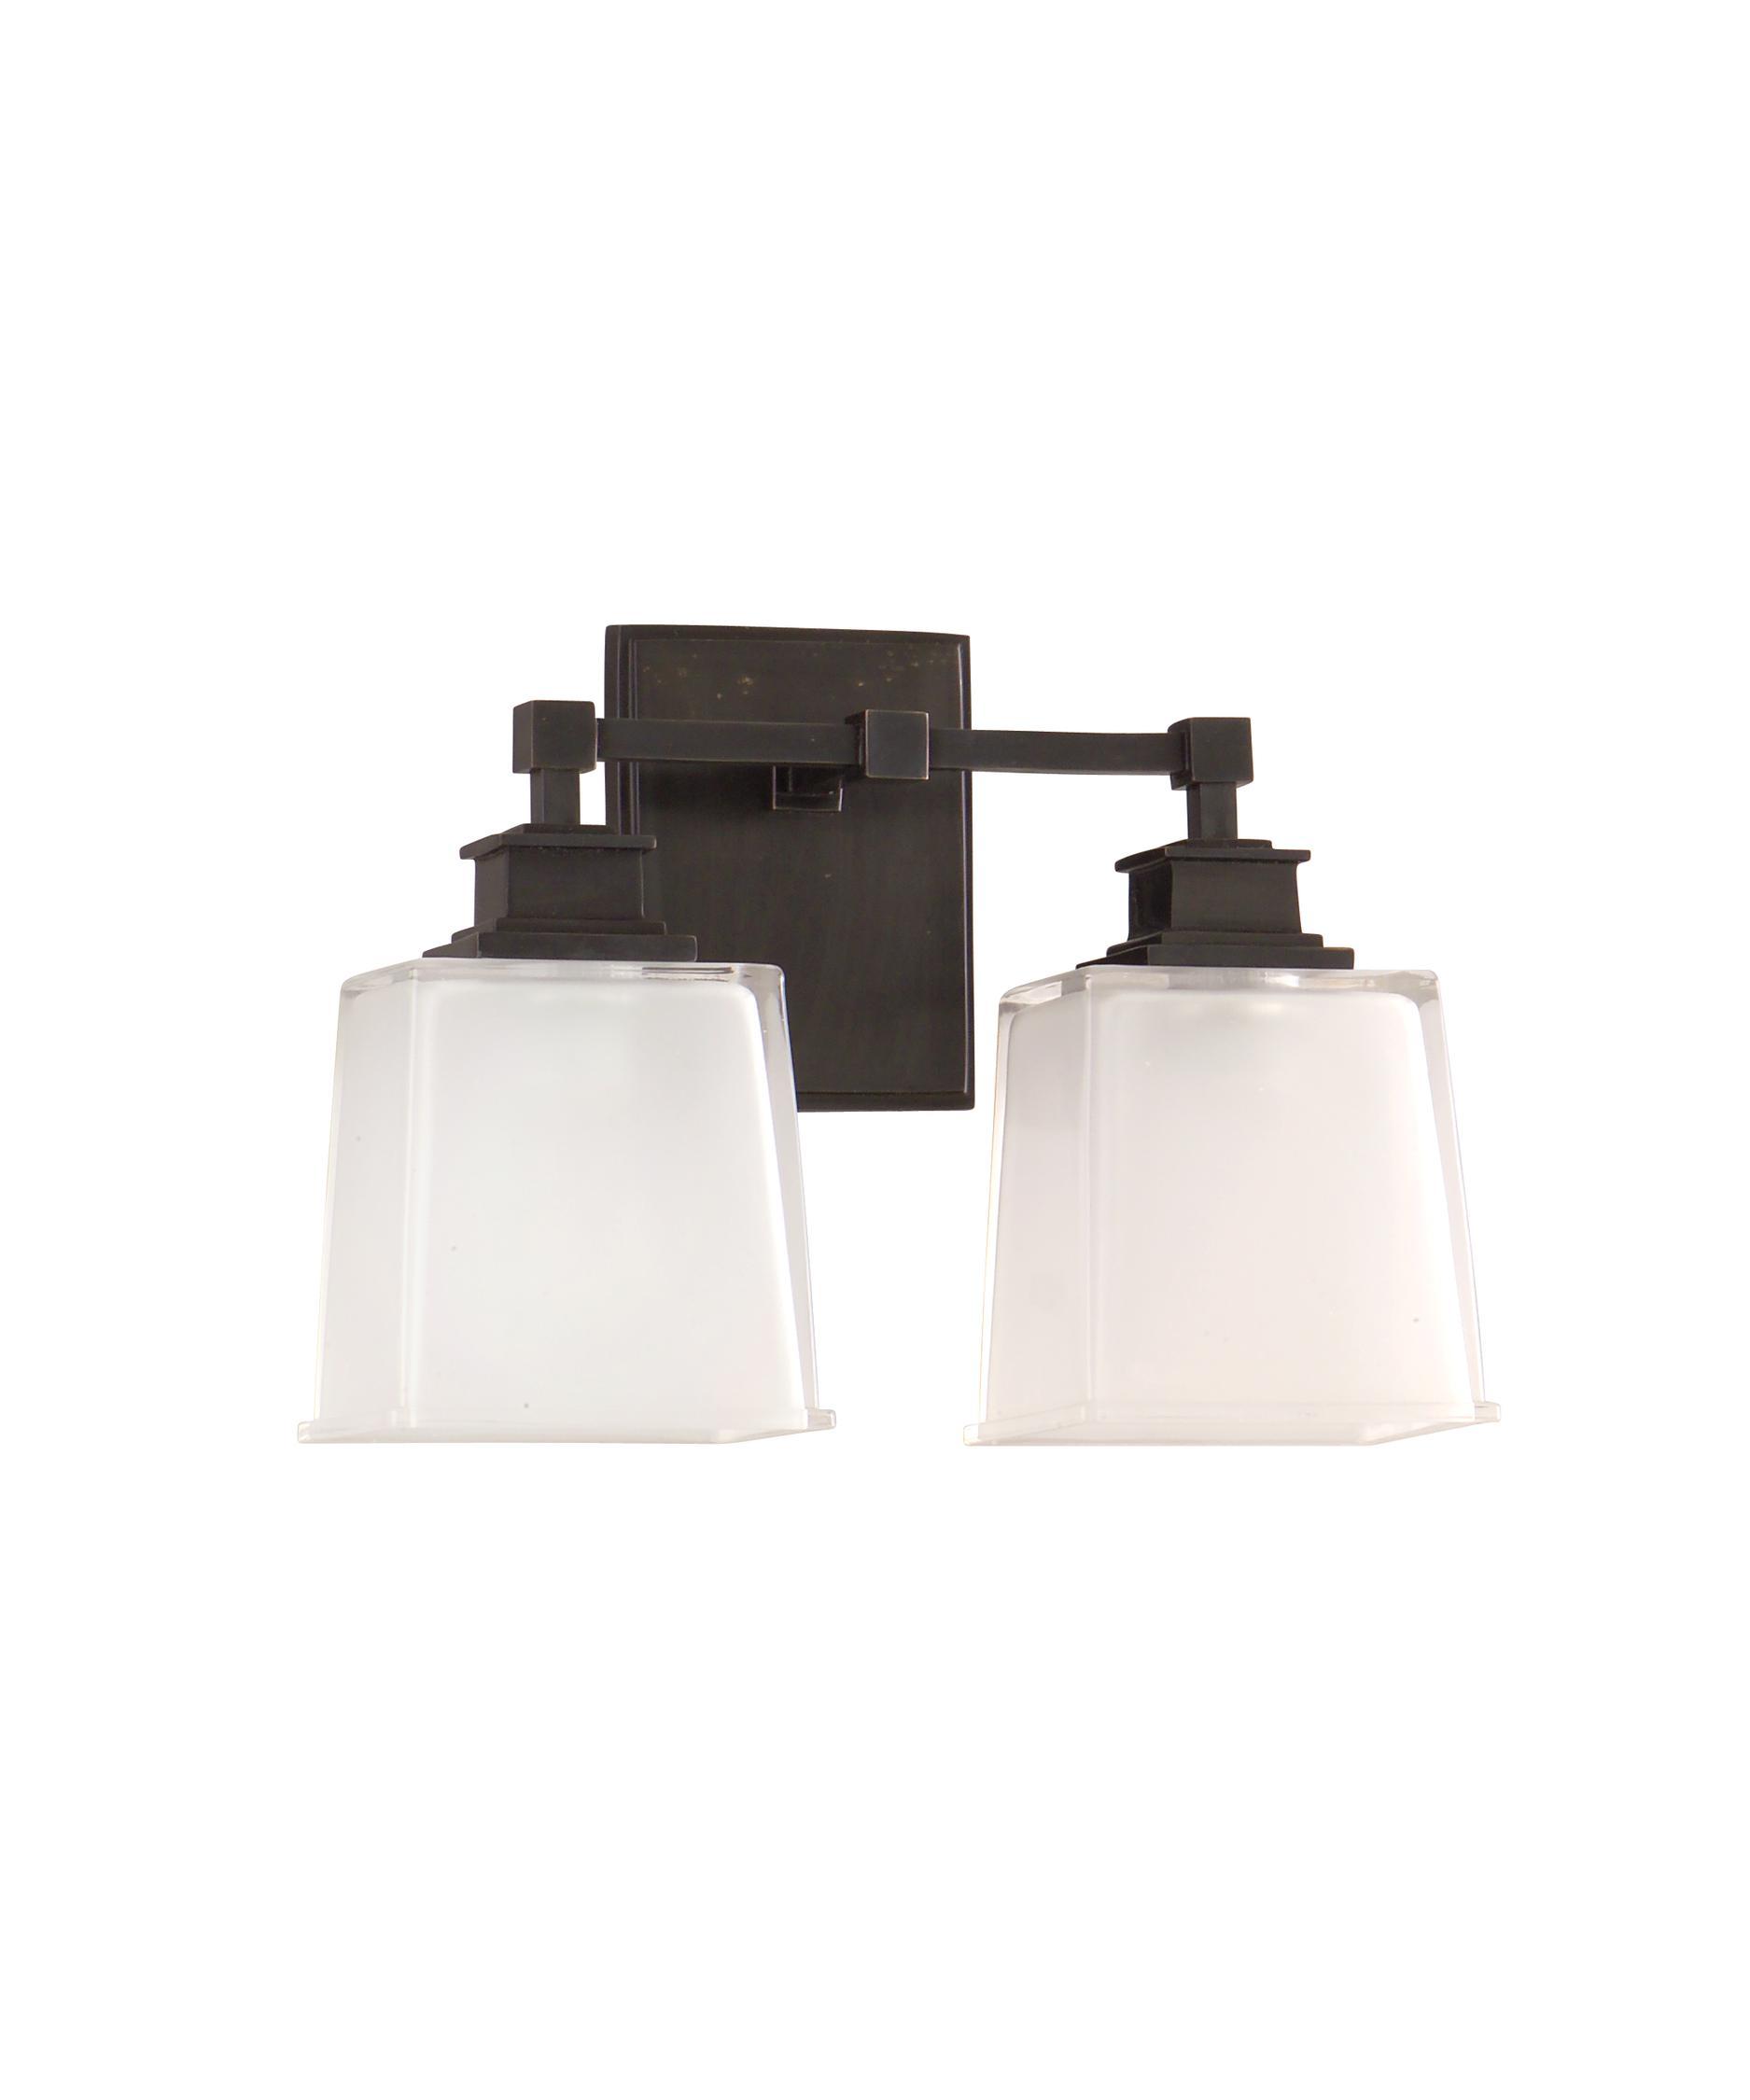 hudson valley 1952 berwick 14 inch bath vanity light